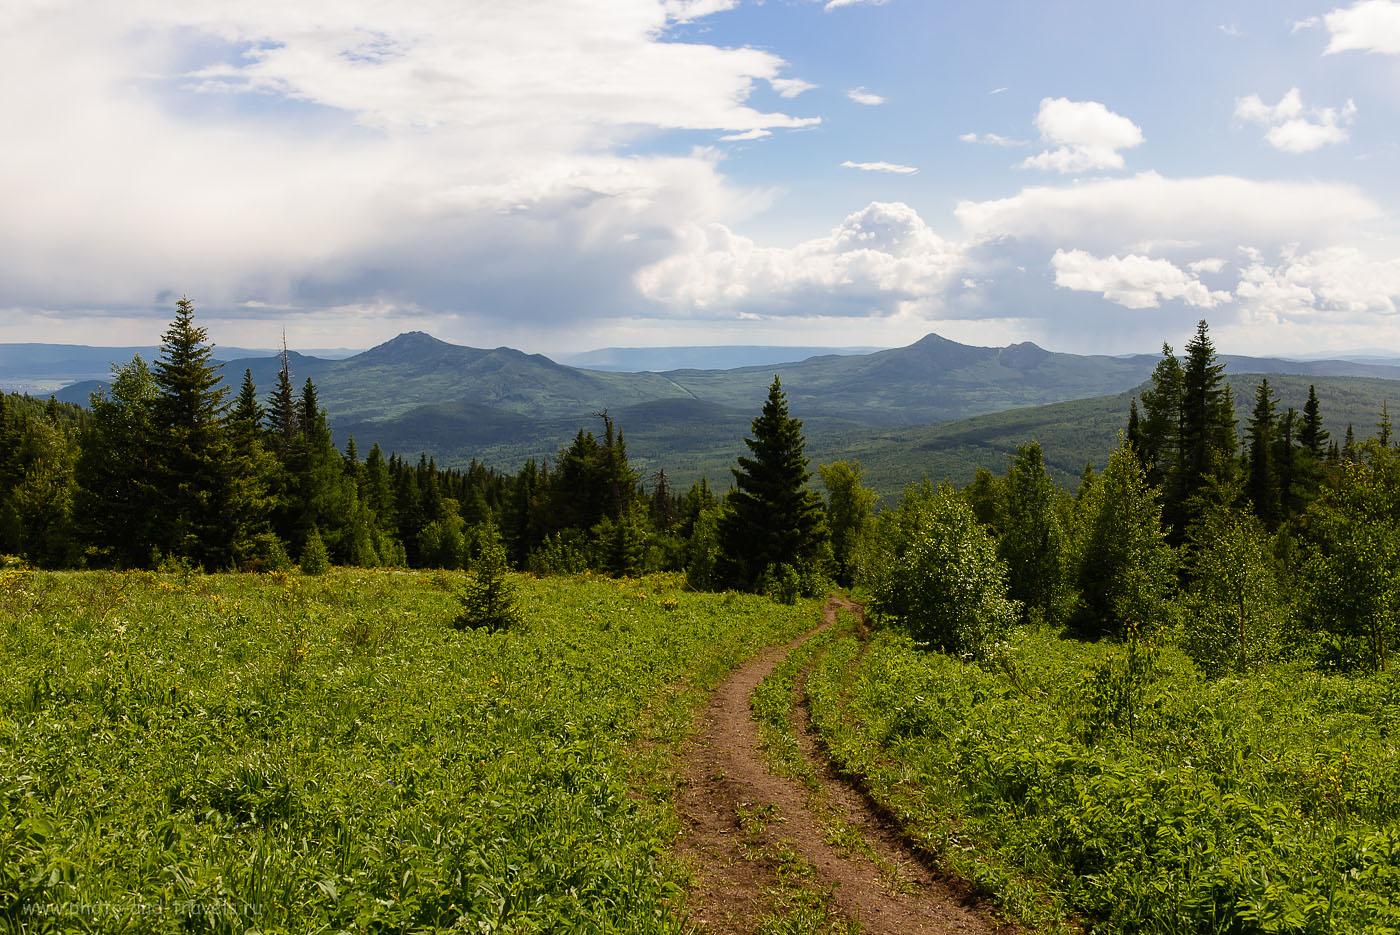 12. Вид на гору Малиновая с Ялангаса (250, 34, 9.0, 1/250)